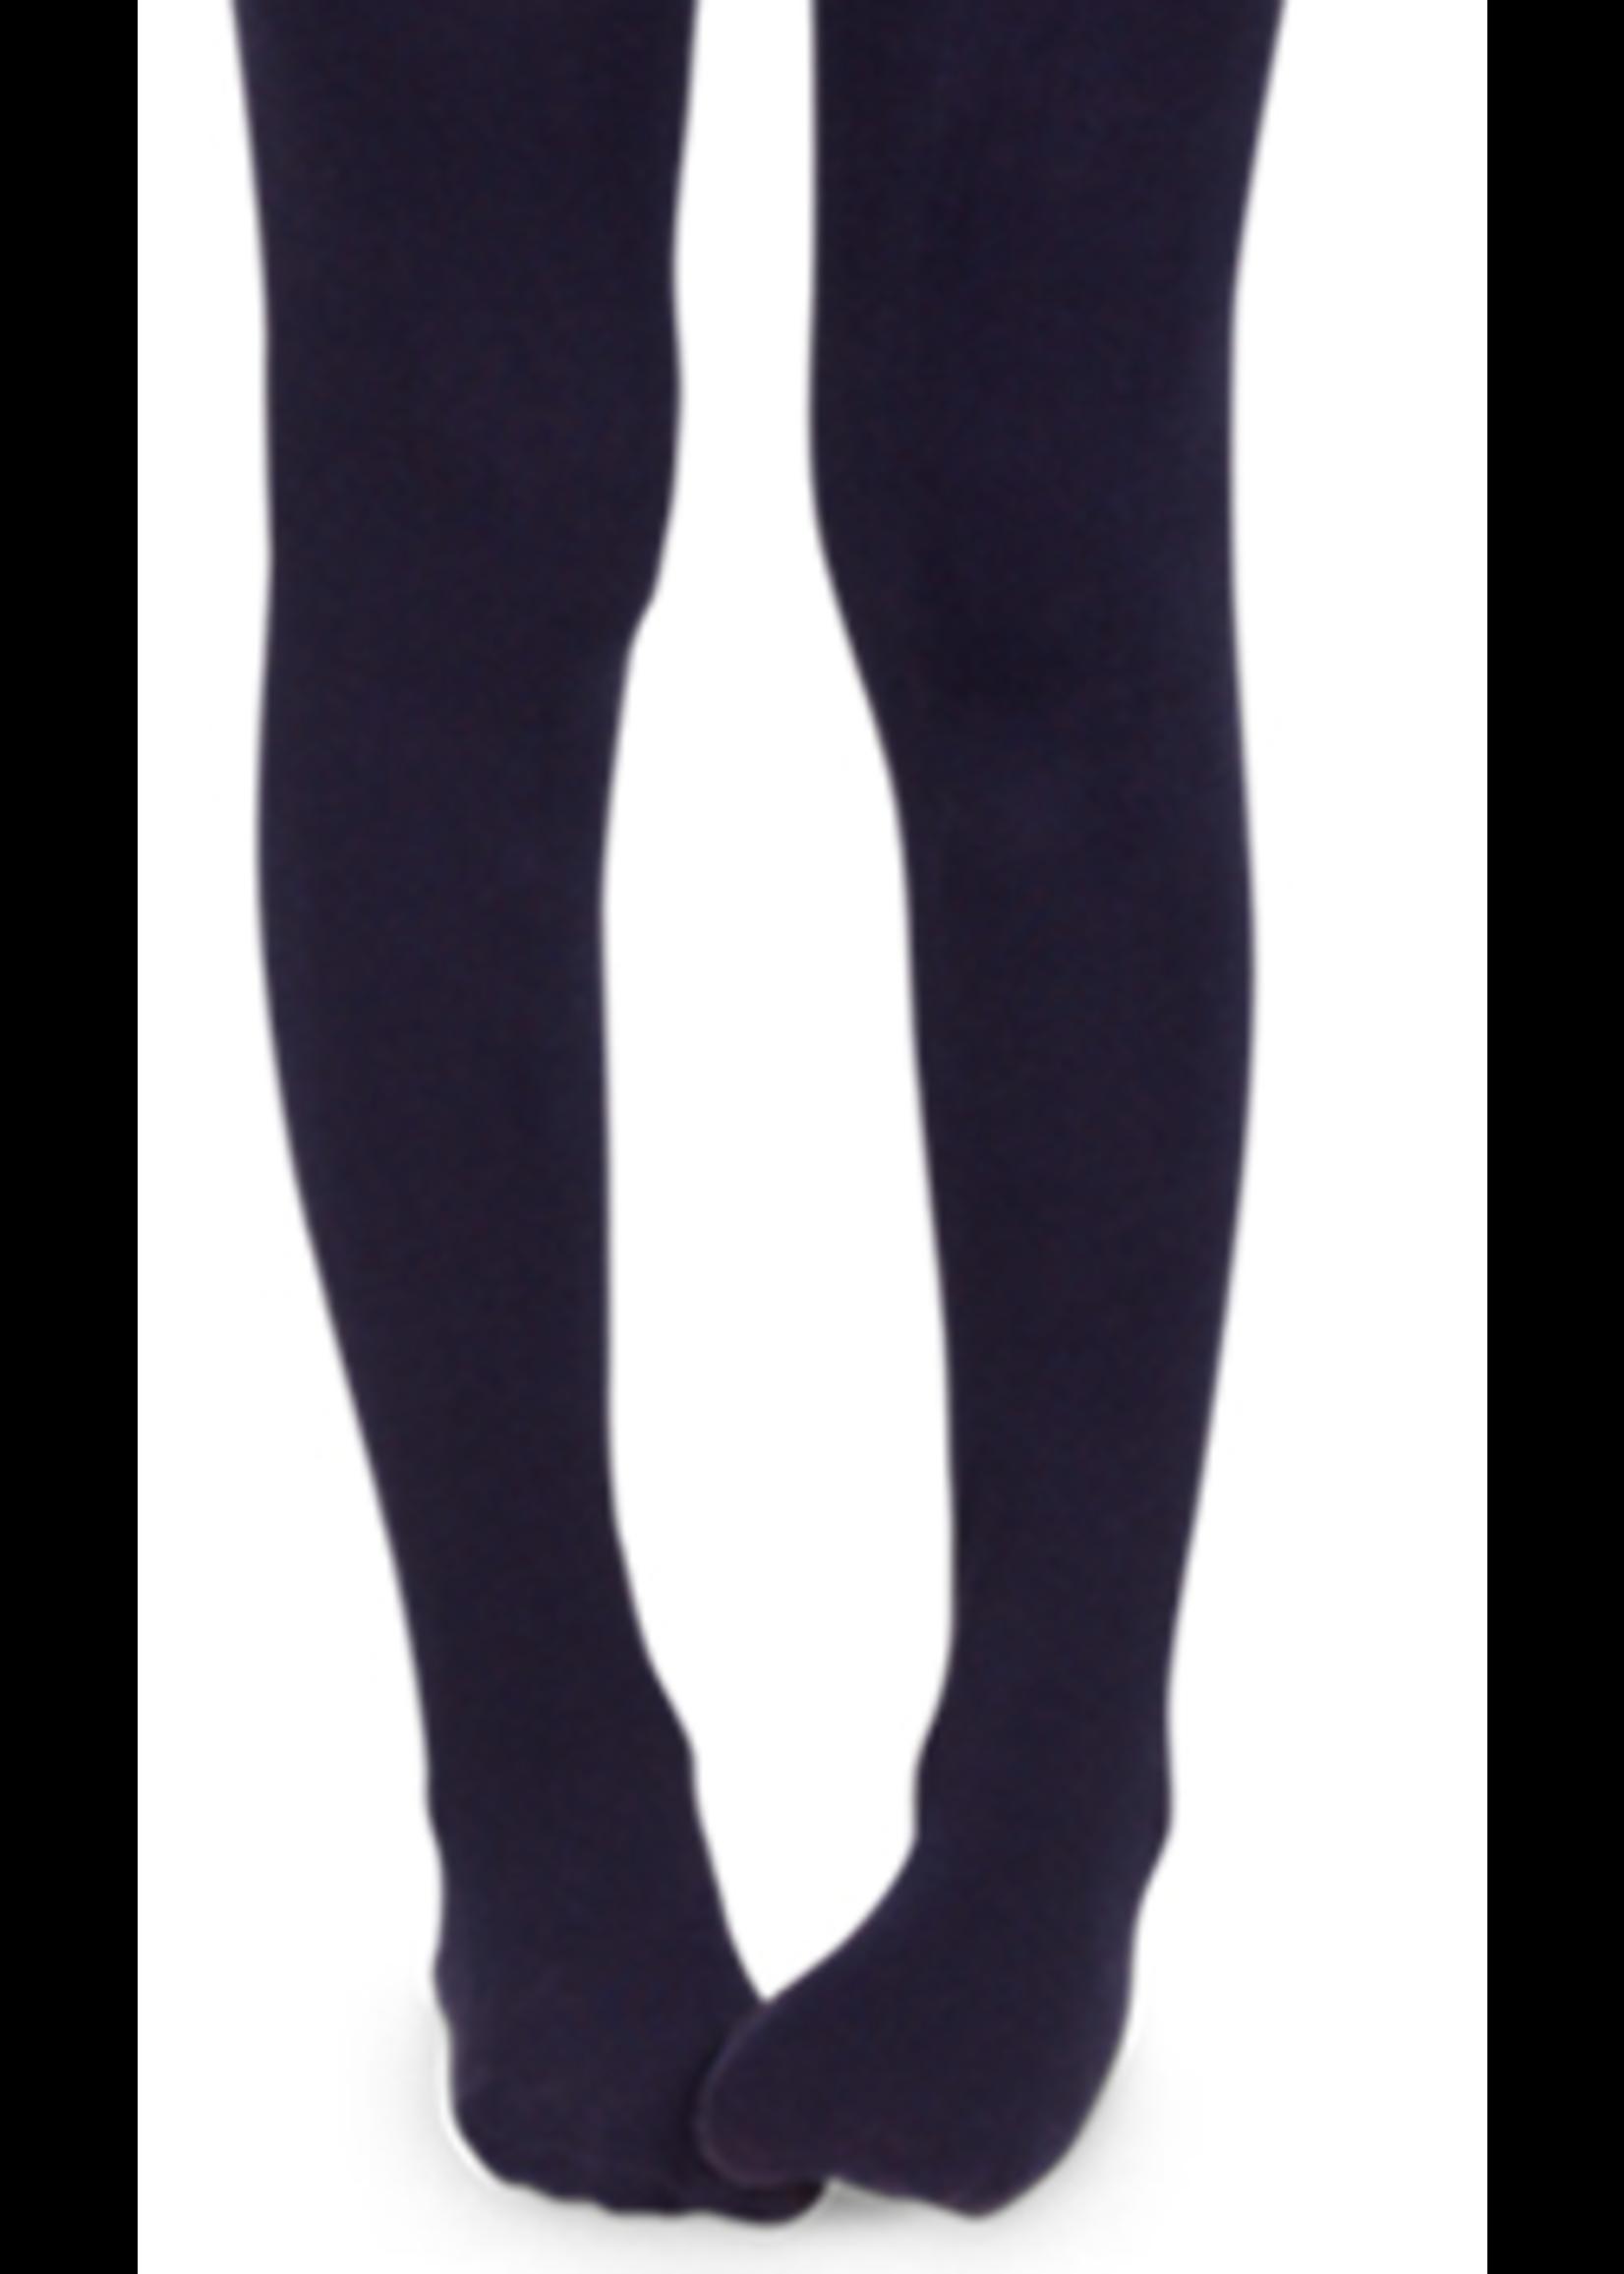 Jefferies Socks Jefferies Sock, School Uniform Smooth Microfiber Legs